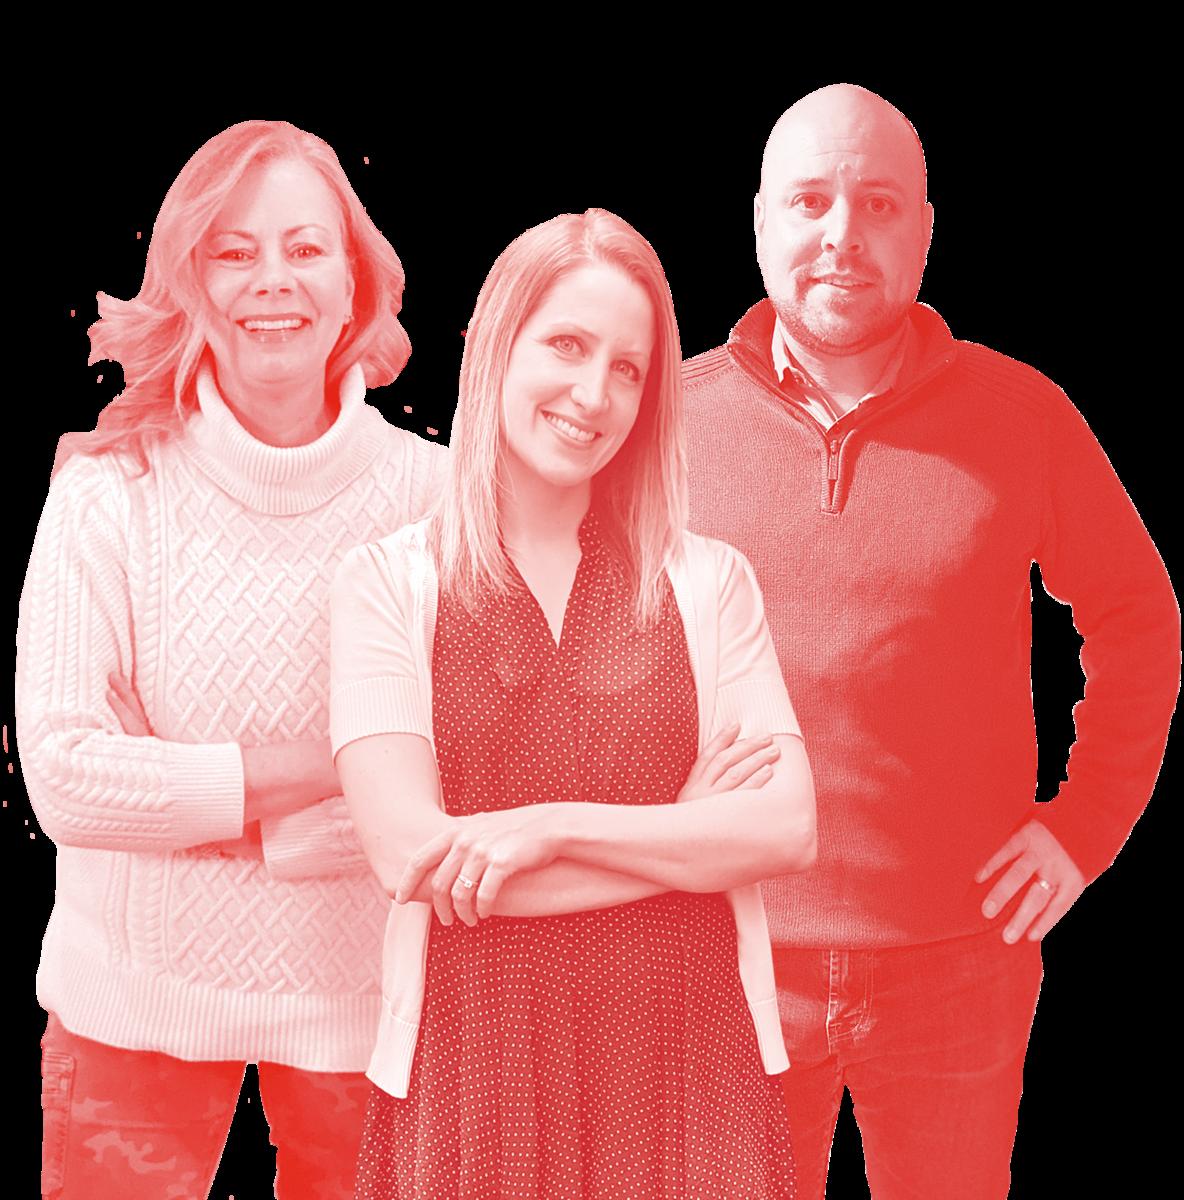 Group photograph of three members of the Copacino Fujikado Account Team